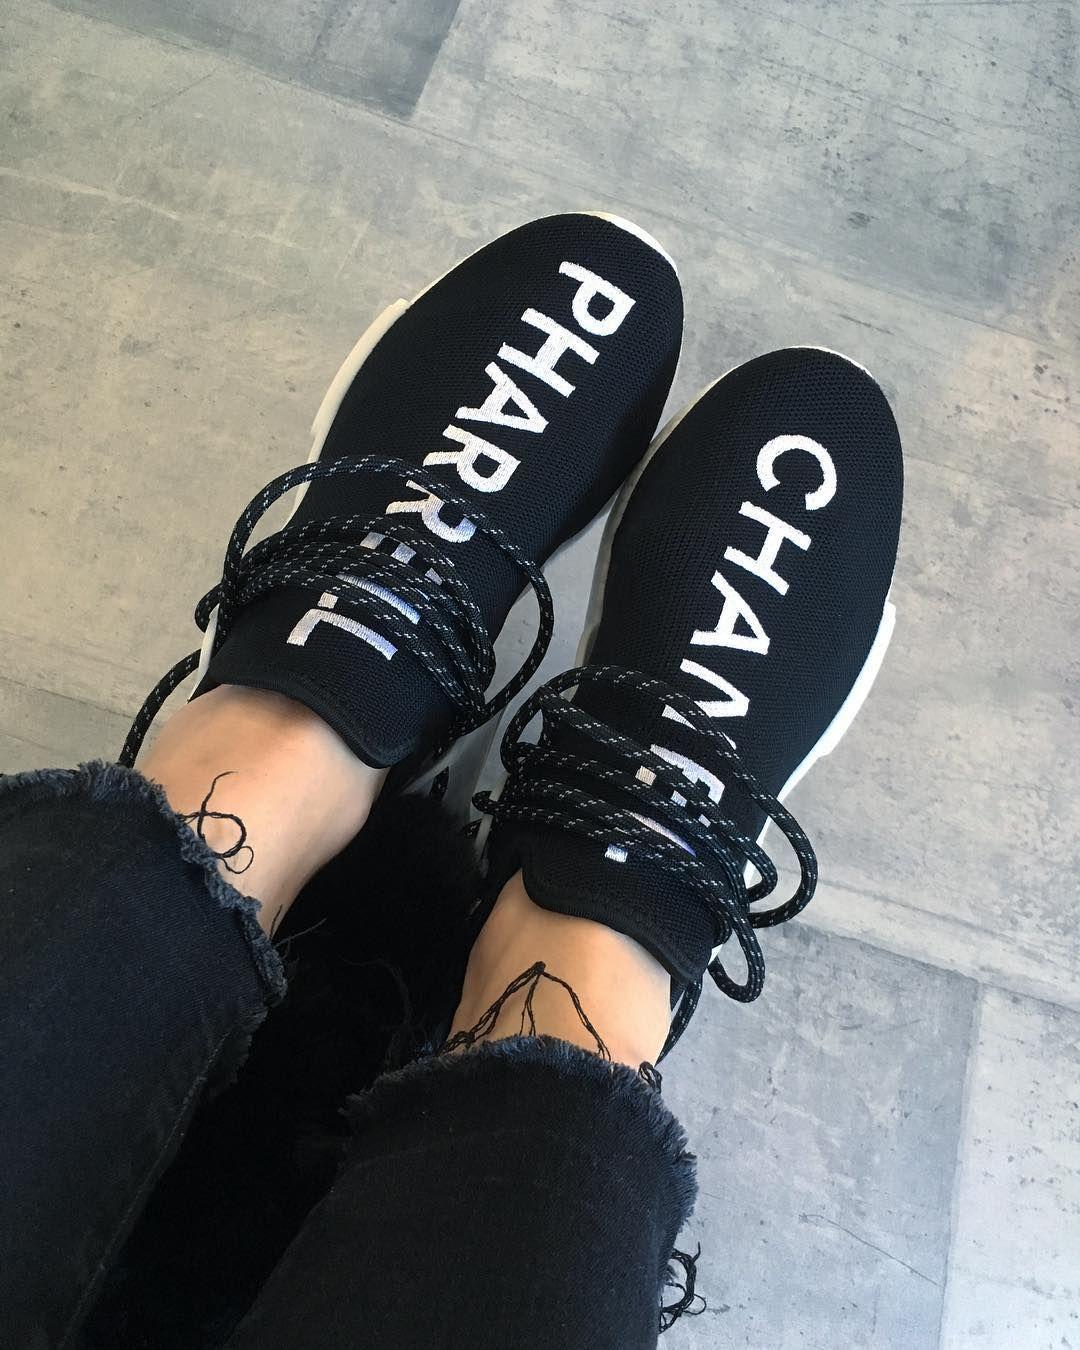 085dc388251 Chanel x Pharrell x adidas NMD Human Race Trail